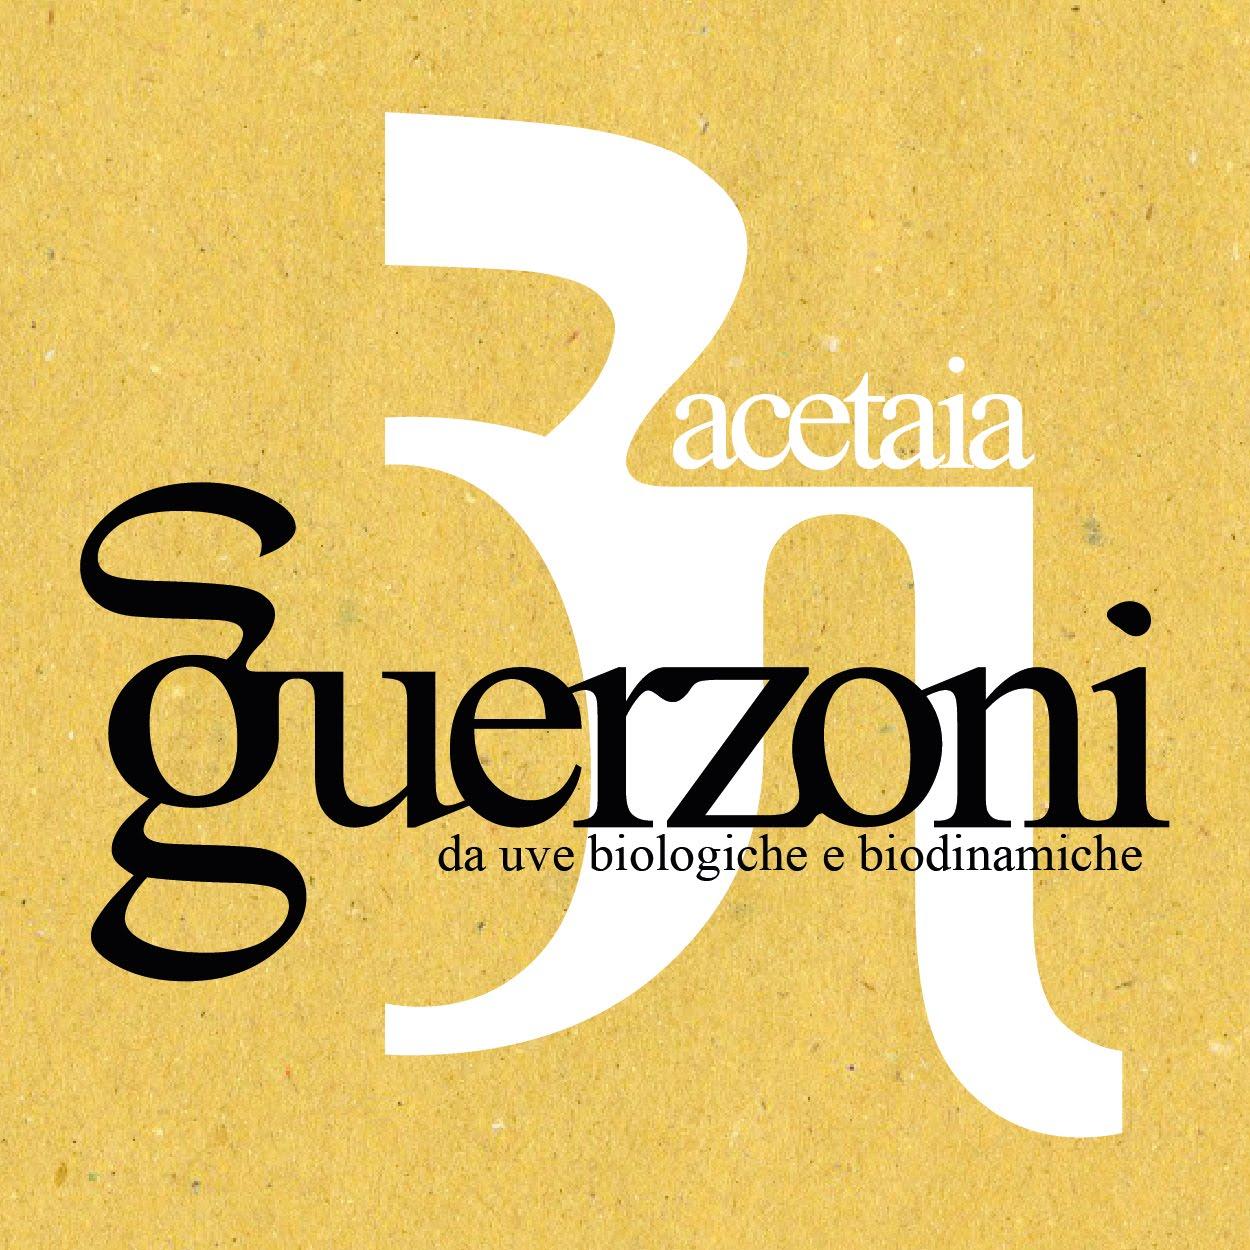 Il Panino Svuotafrigo - Contest 2016 Acetaia Guerzoni